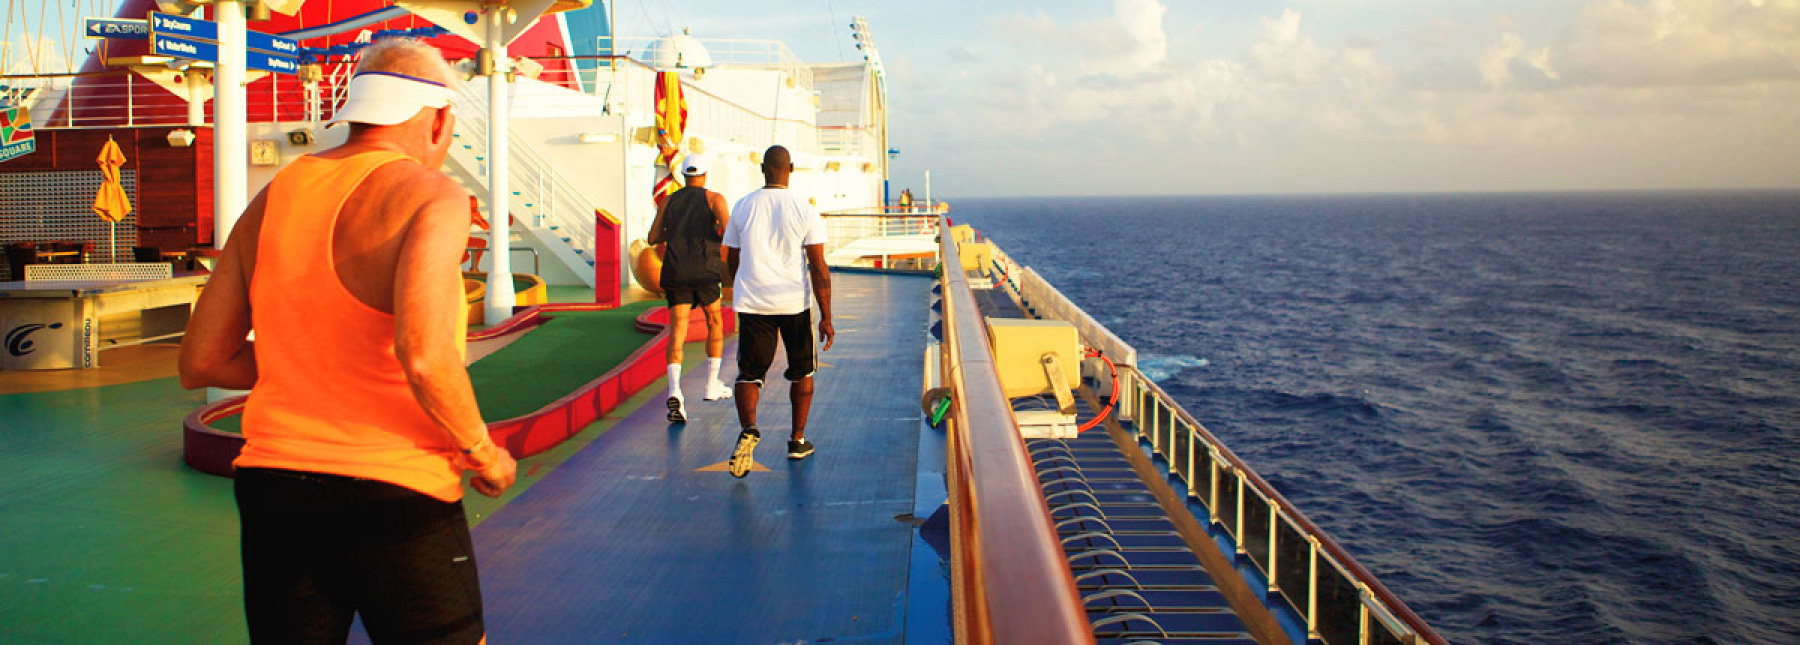 Carnival Cruise Lines Carnival Dream Exterior jogging-track-1.jpeg